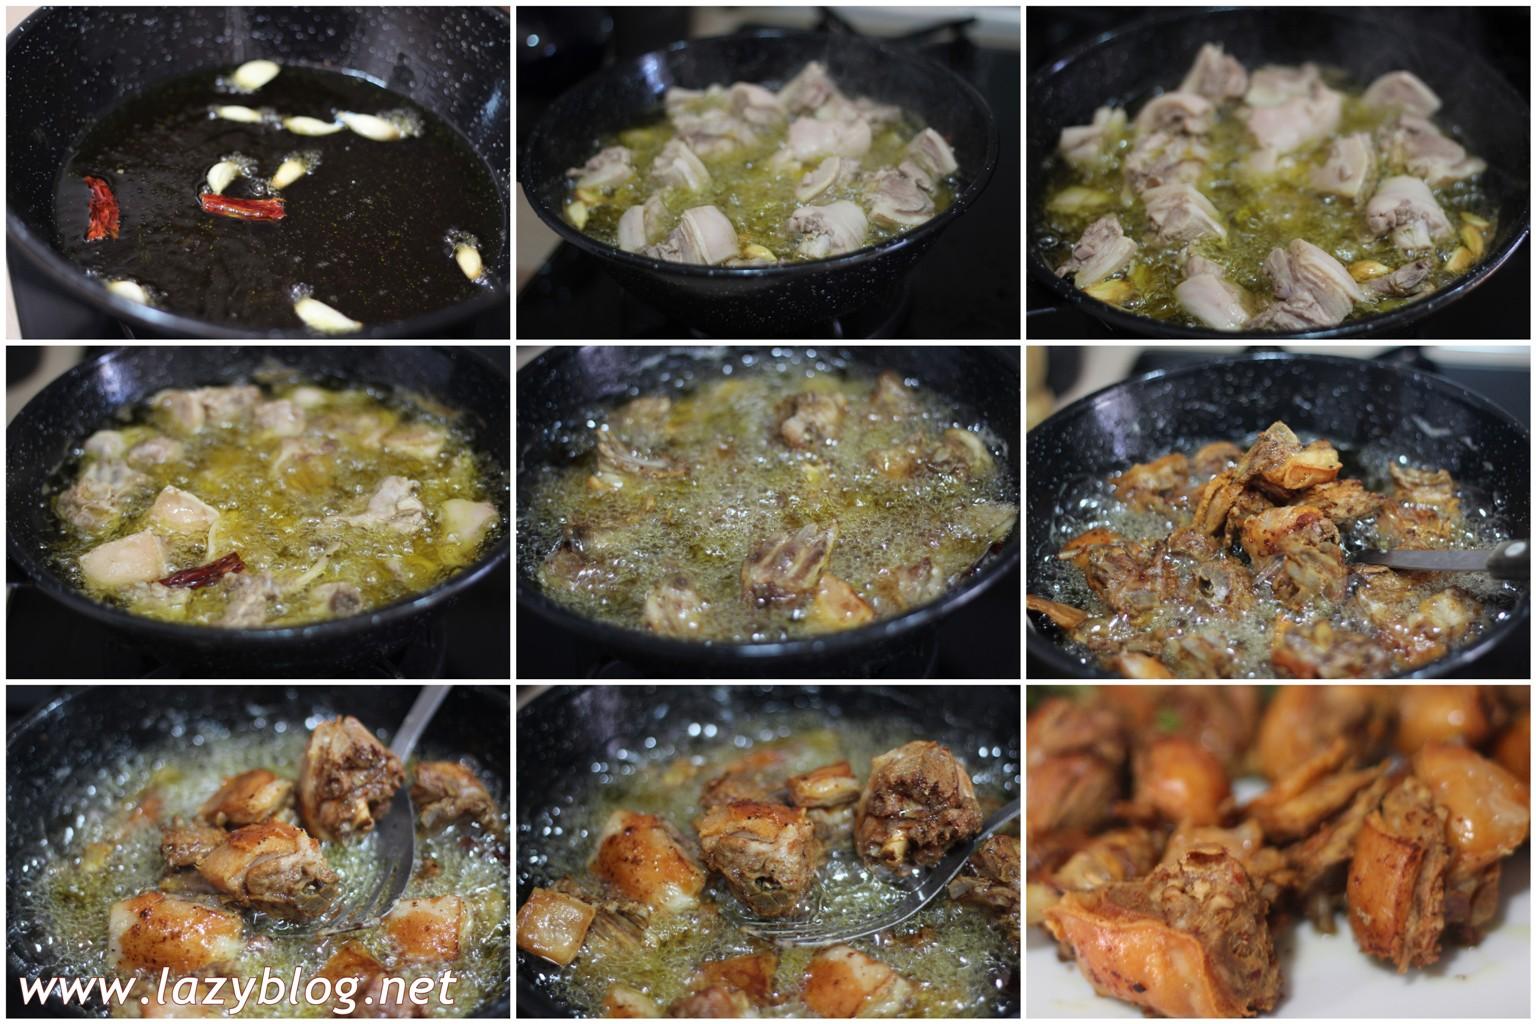 Cocinar Cochinillo | Lazy Blog Especial Cochinillo 1 Receta De Cuchifrito